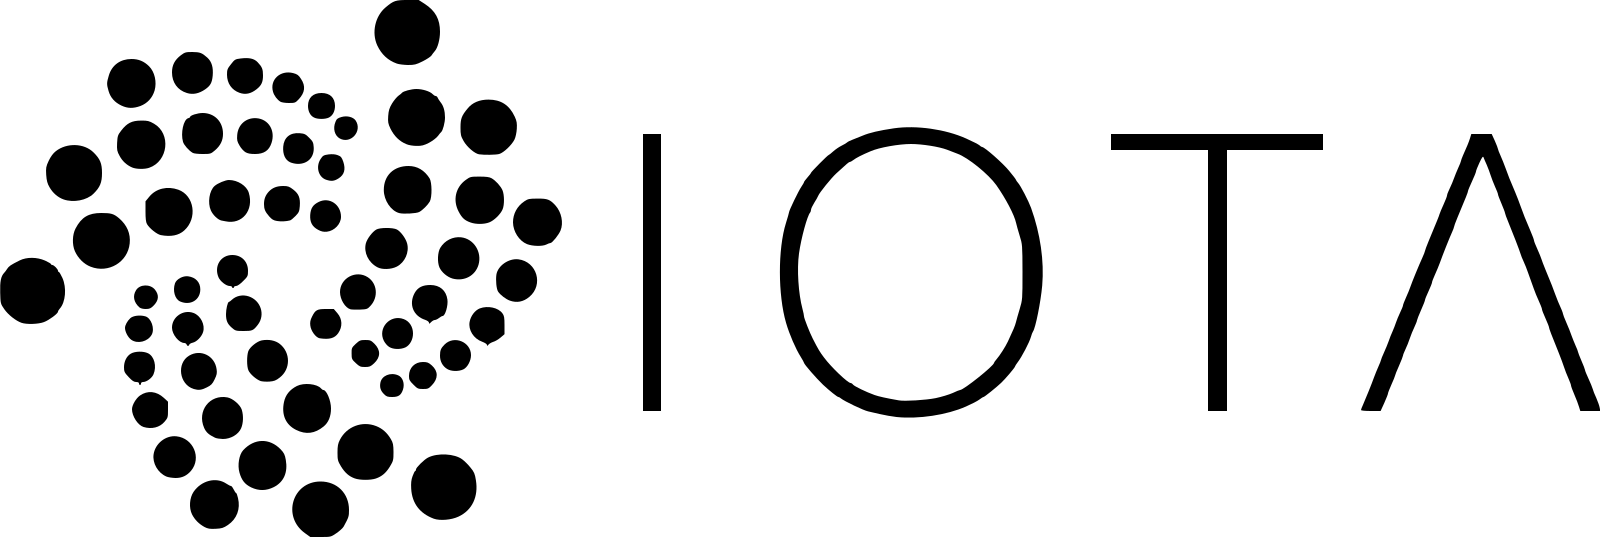 IOTA logó